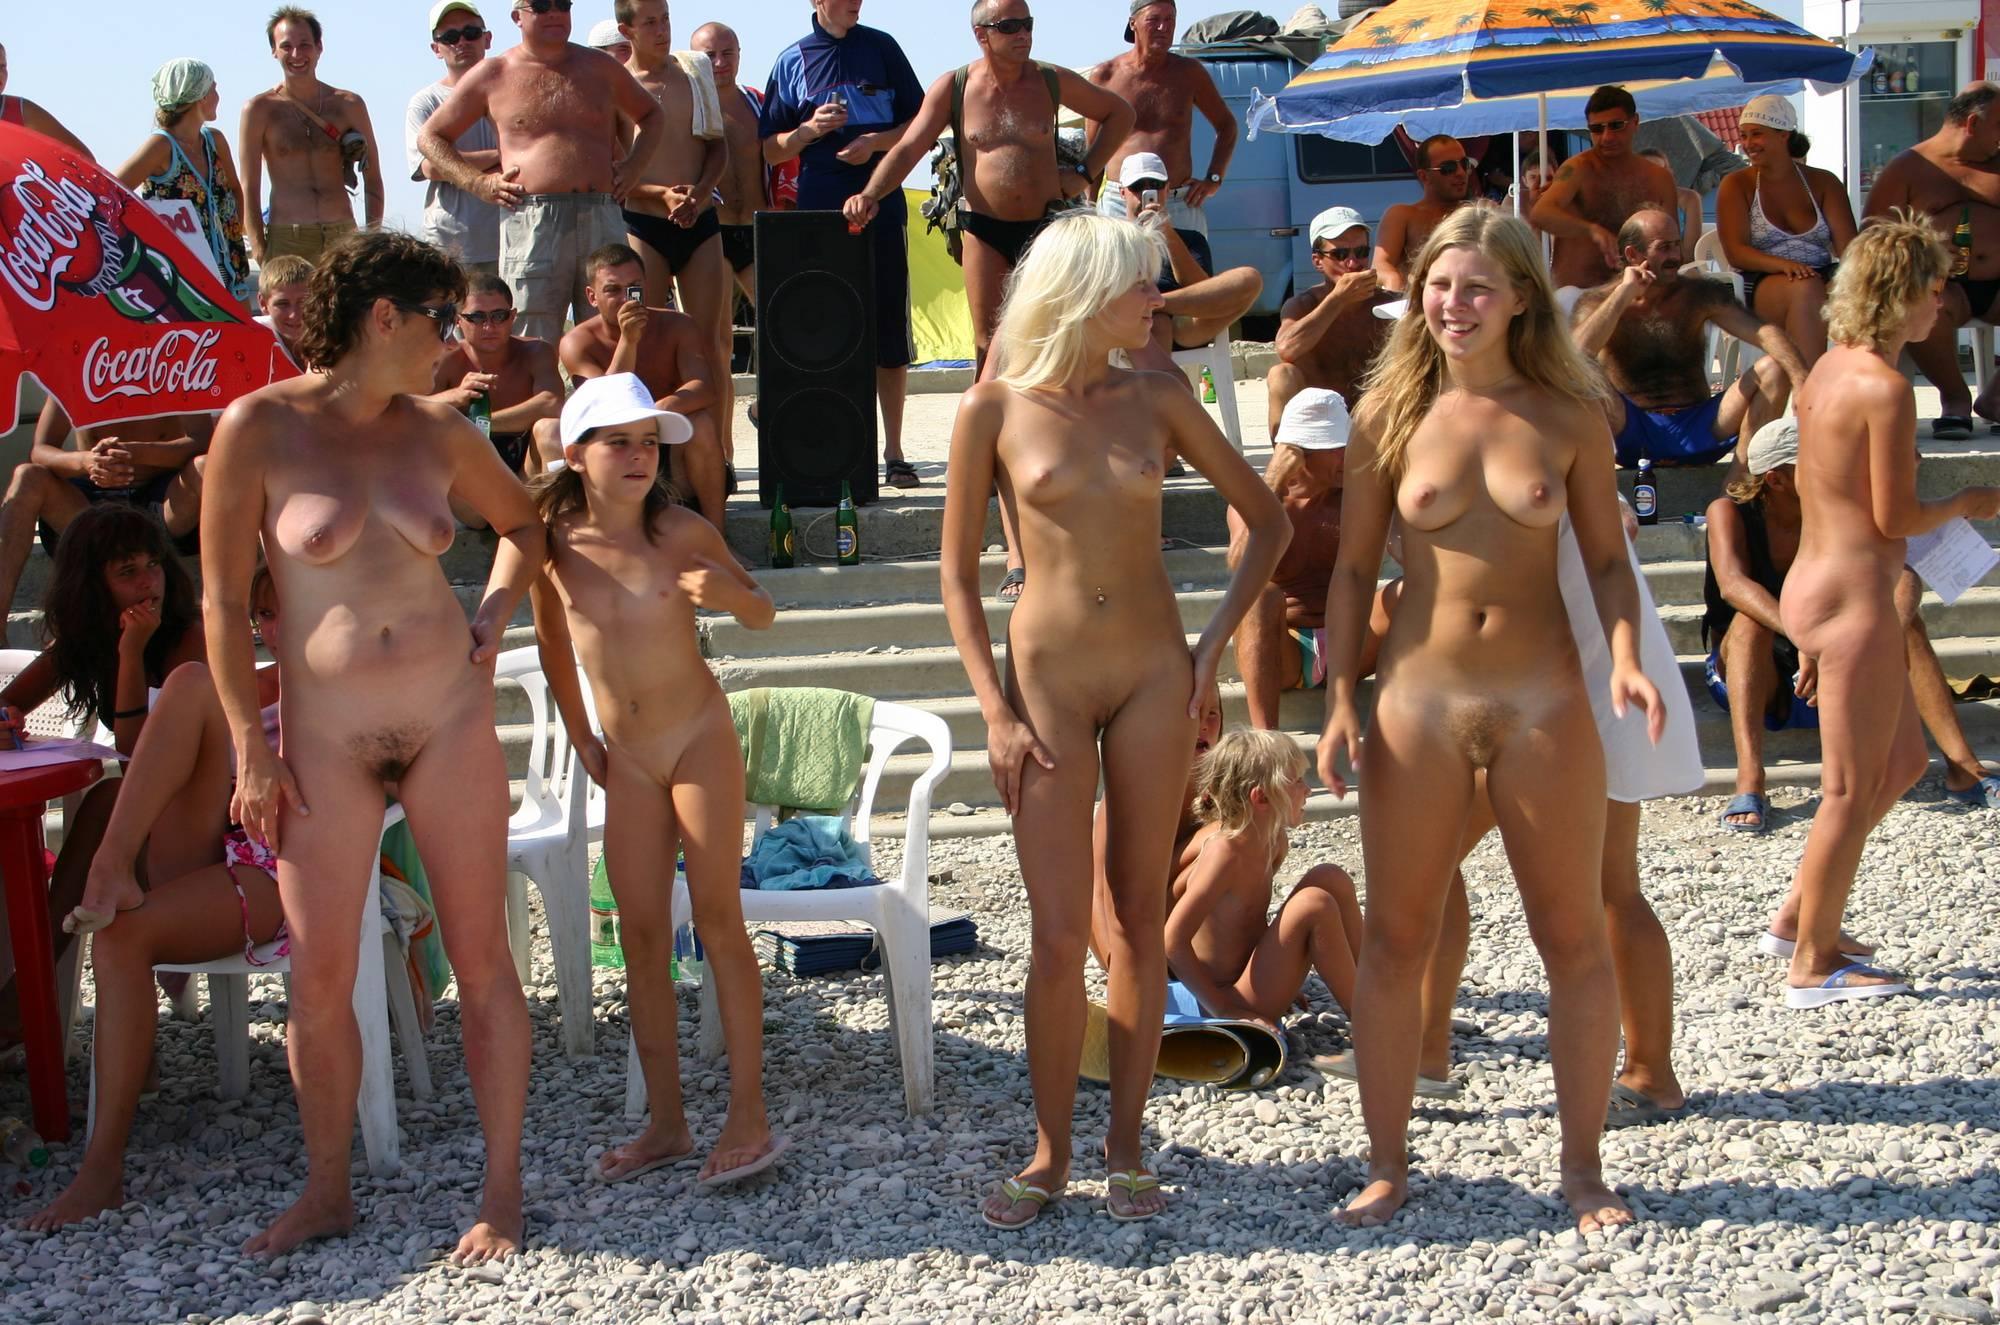 Nudist Pics Nudist Dance Family Show - 1